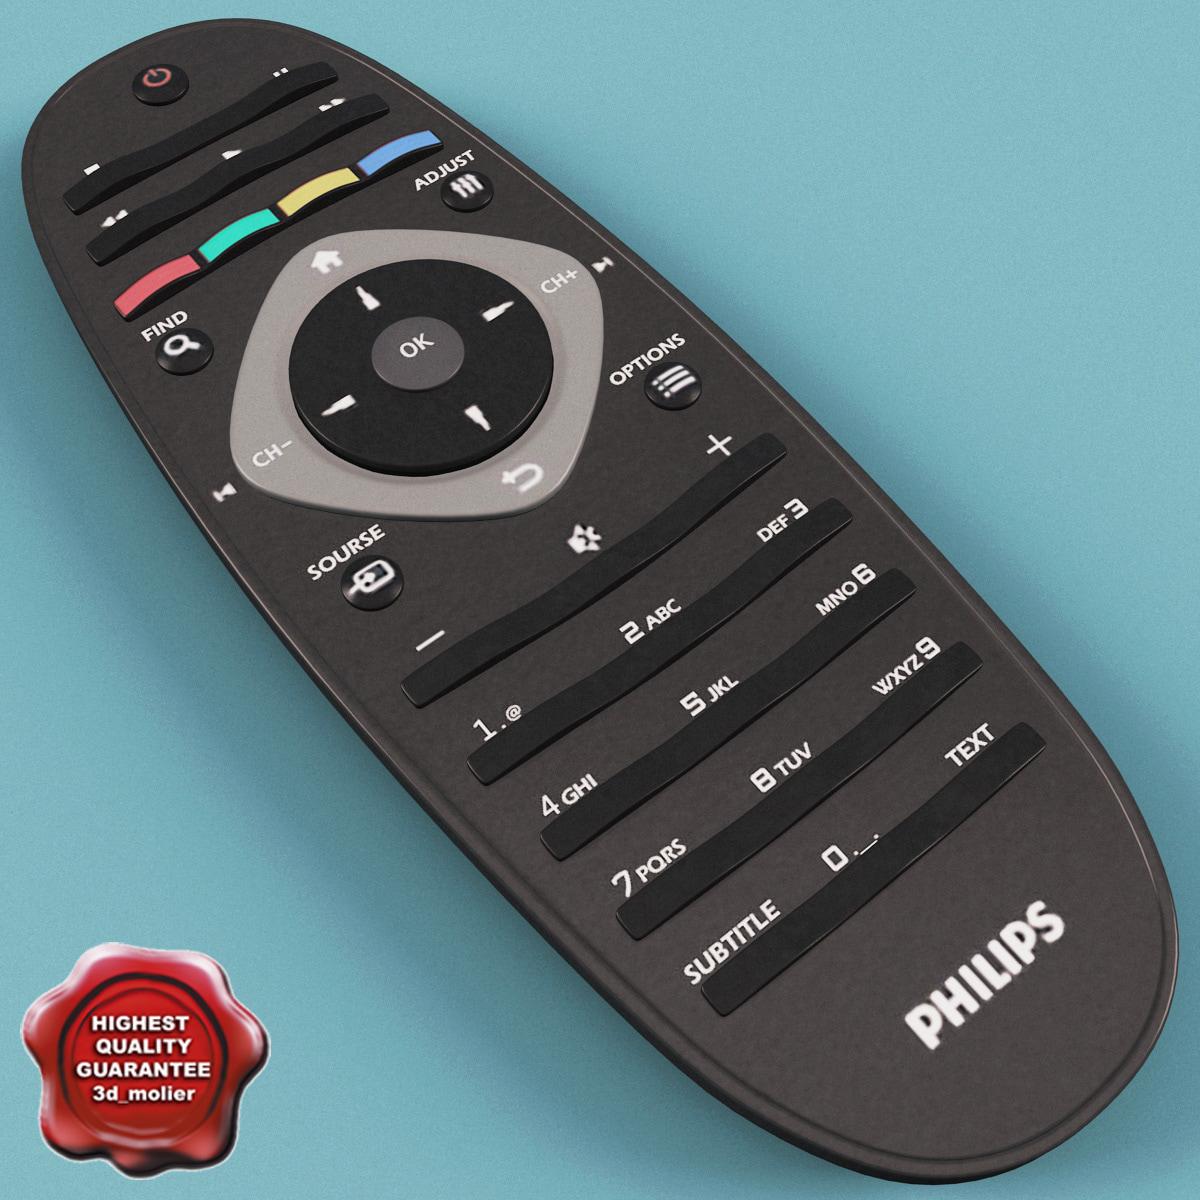 Philips_TV_Remote_00.jpg